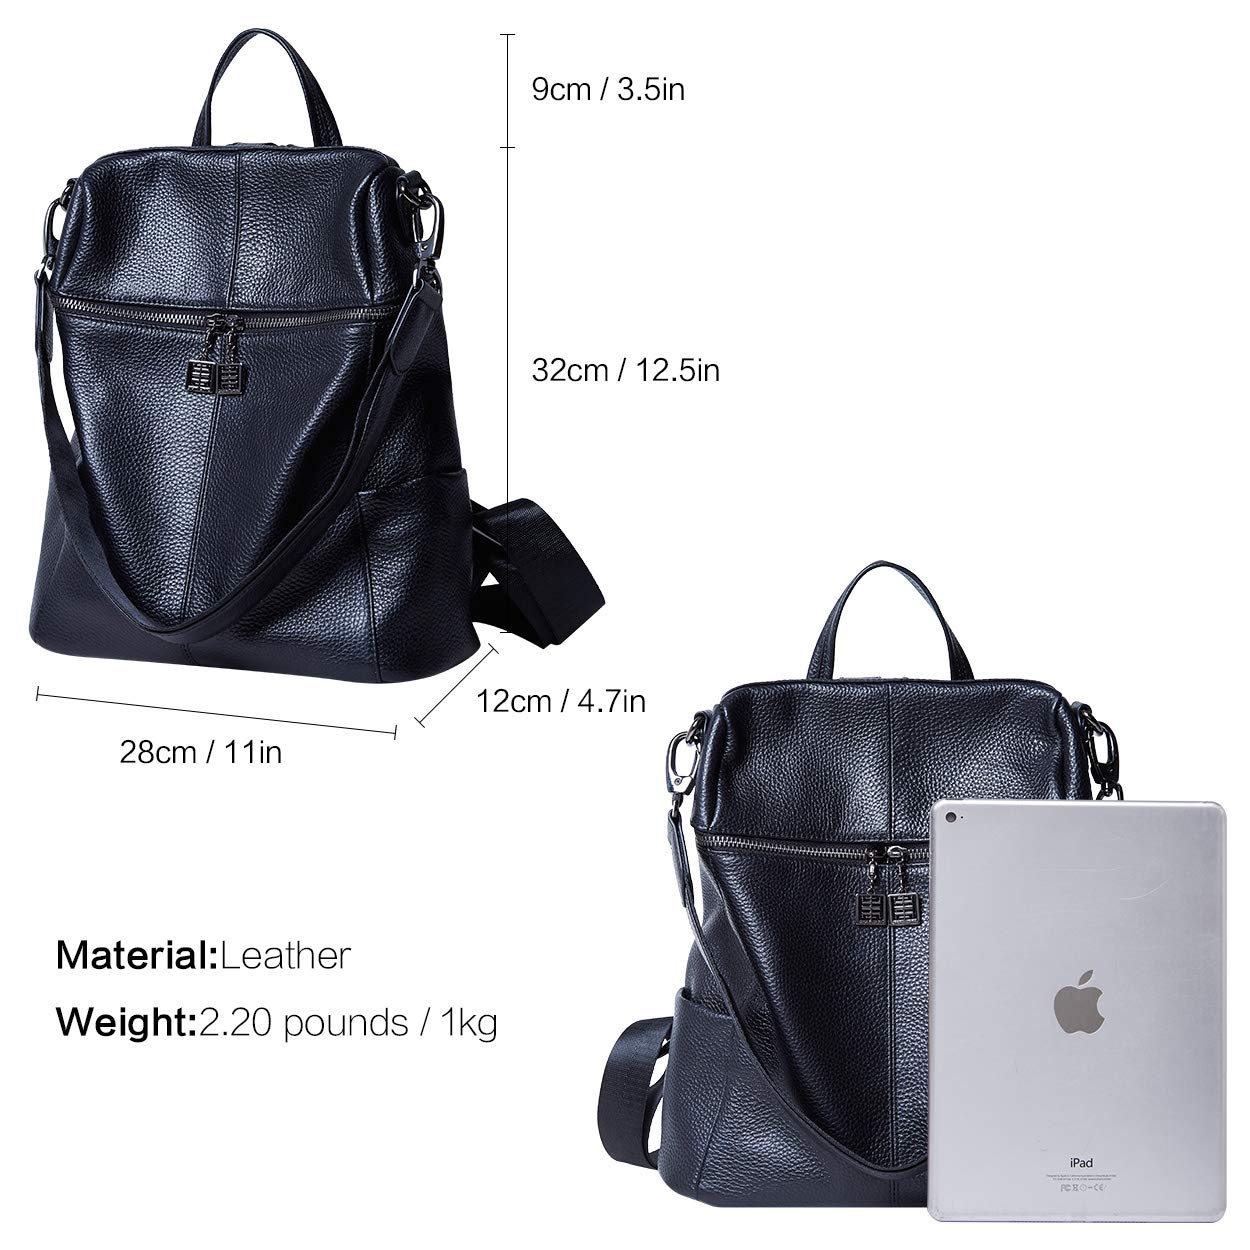 Amazon.com  BOYATU Convertible Genuine Leather Backpack Purse for Women  Fashion Travel Bag  Clothing 0aa86e1f5d20d